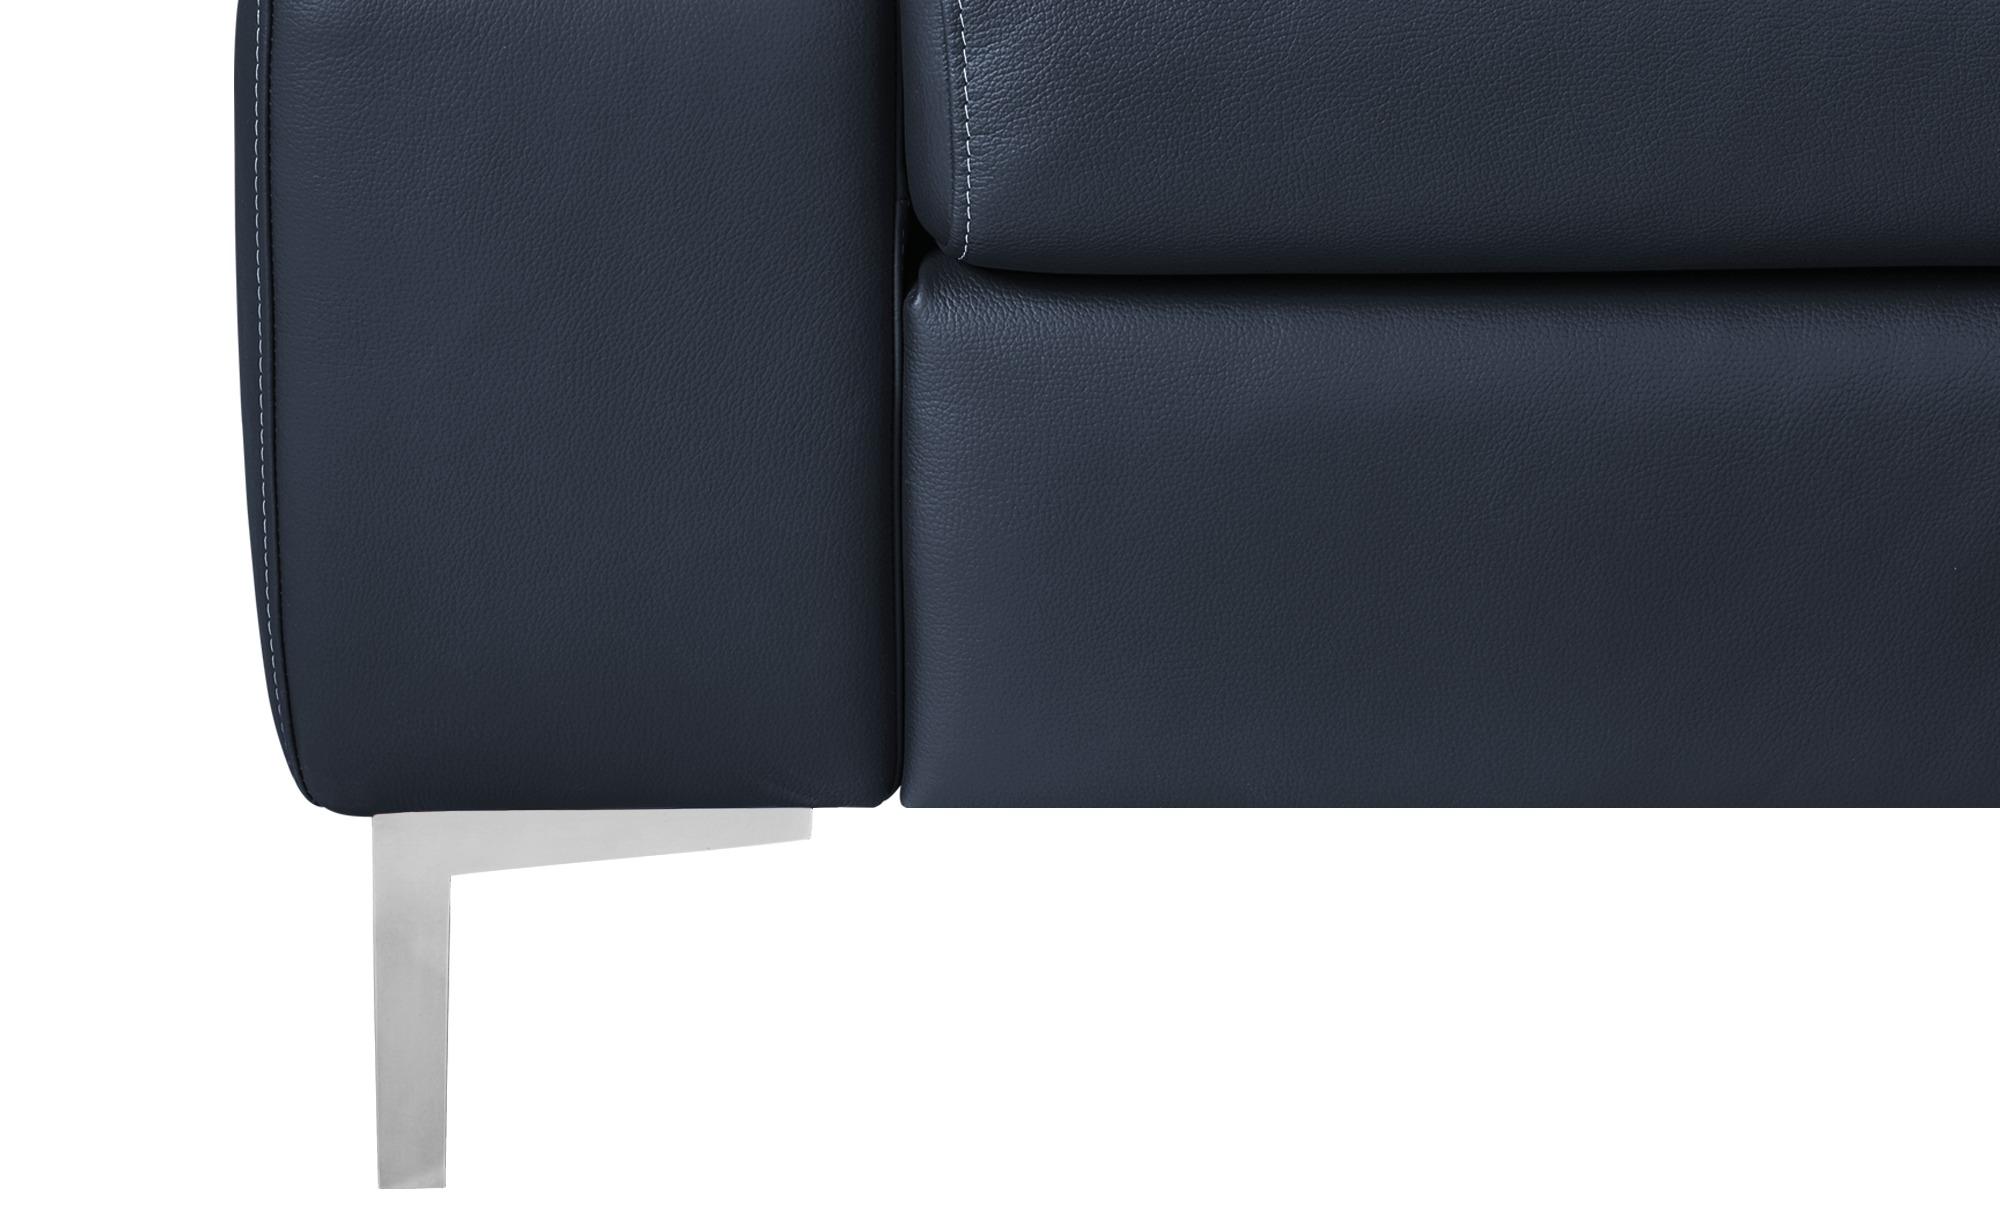 W.SCHILLIG Ecksofa blau - Leder Arturo ¦ blau ¦ Maße (cm): H: 70 Polstermöbel > Sofas > Ecksofas - Höffner